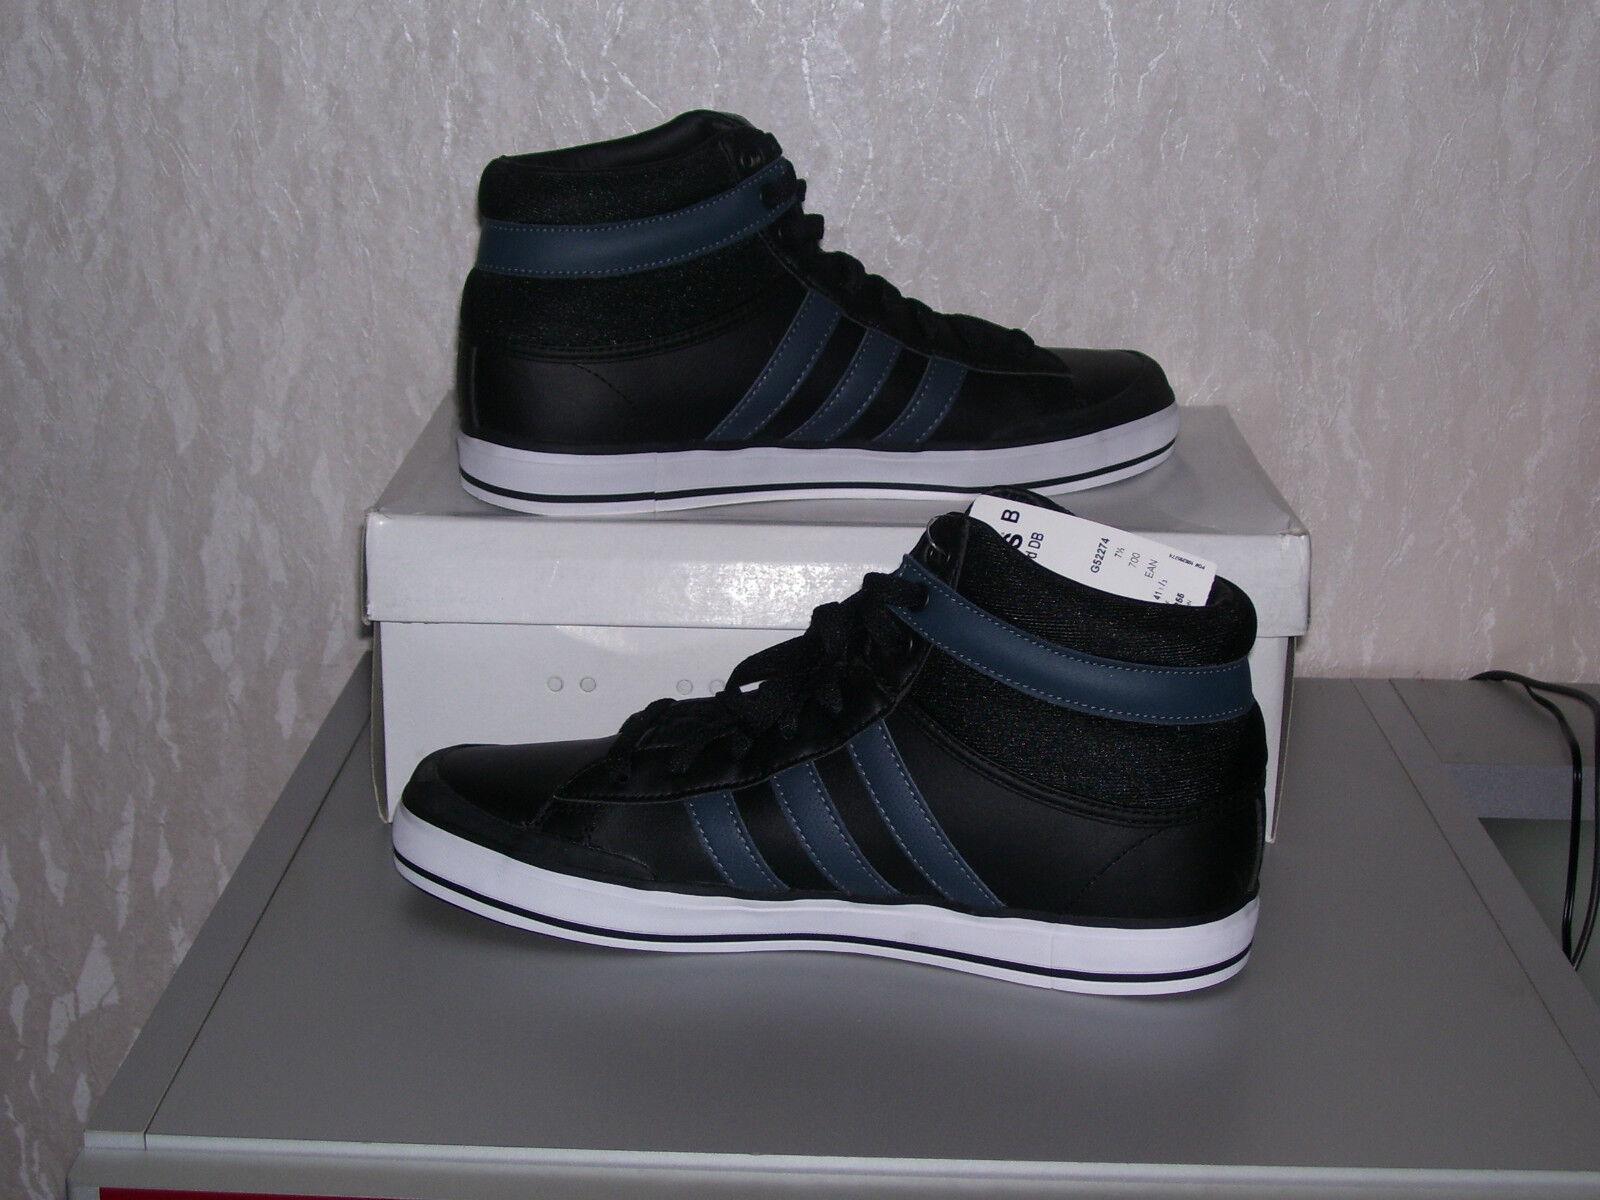 adidas Daily Fresh Mid David Beckham Sportschuhe Sneaker Grösse 40 44 45 neu